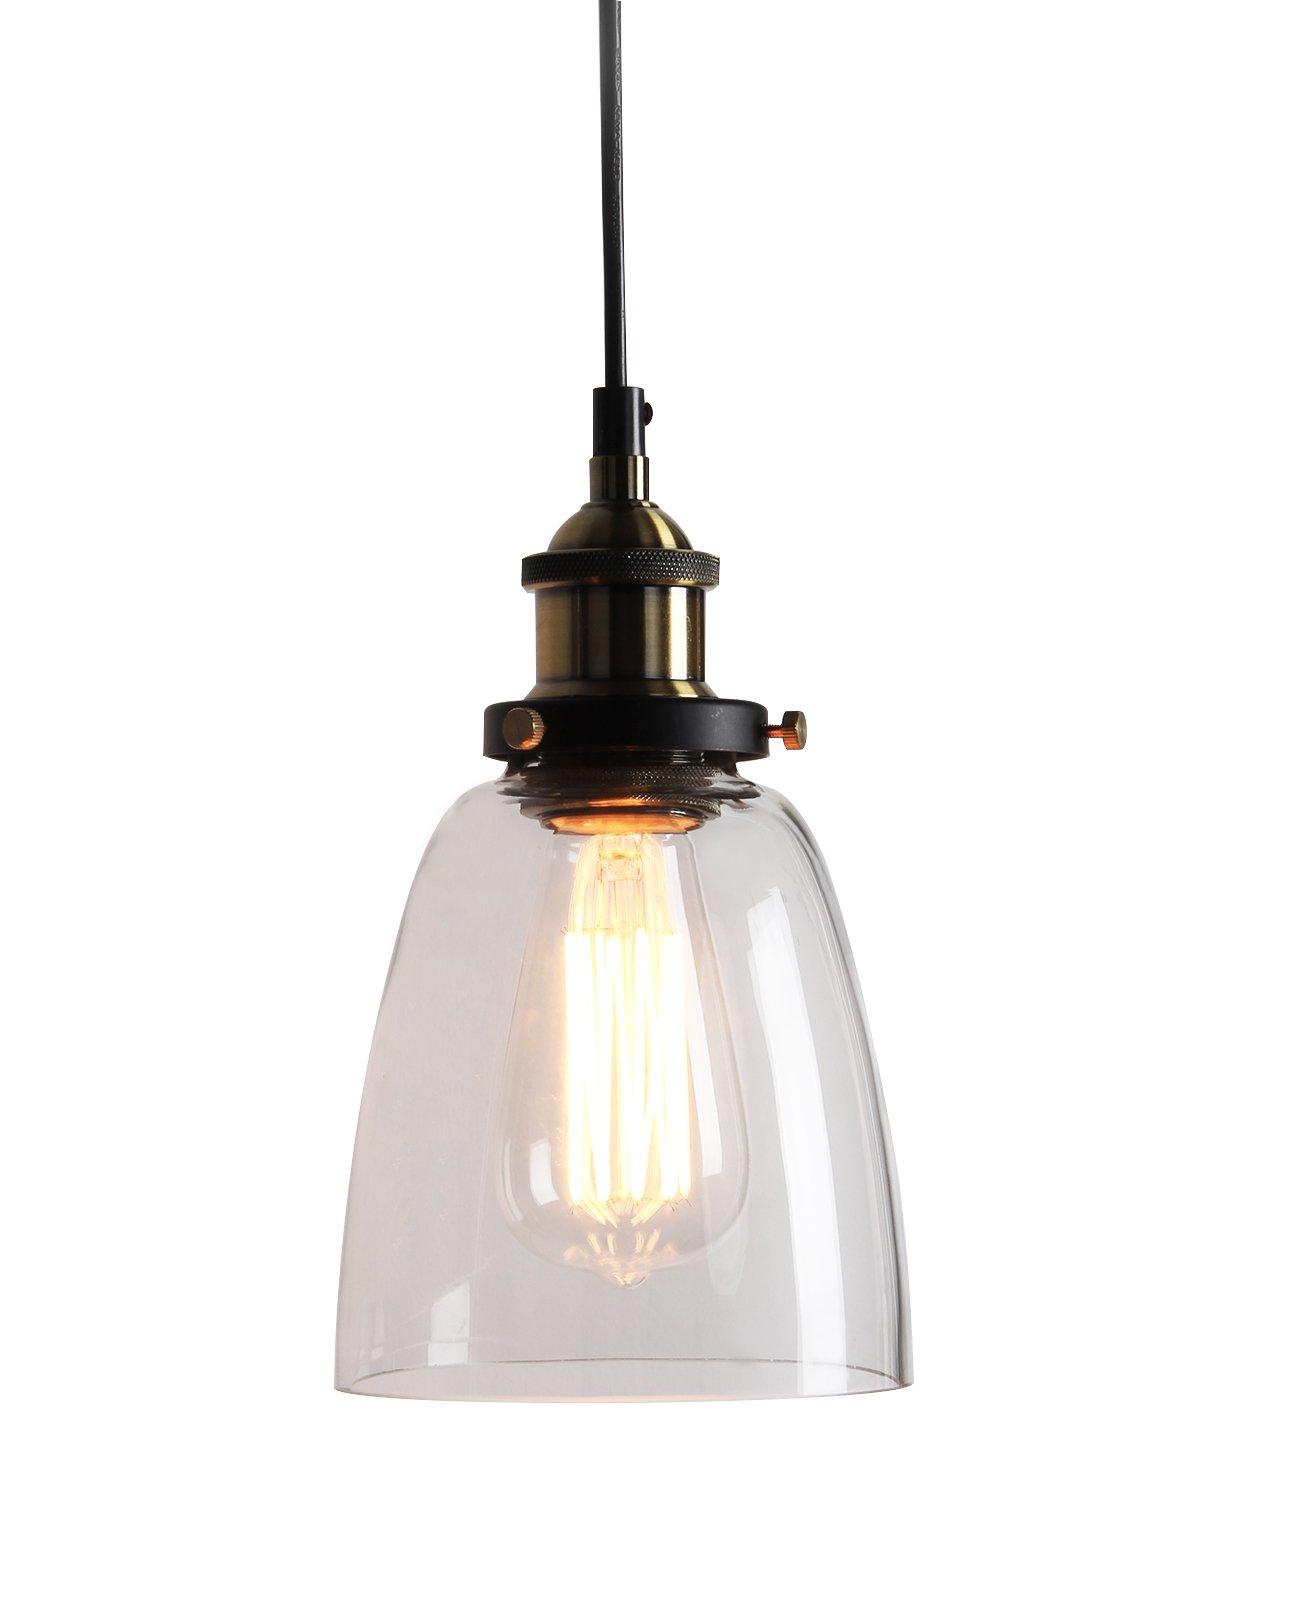 Buyee Modern Vintage Industrial Retro Pendant Edison Light